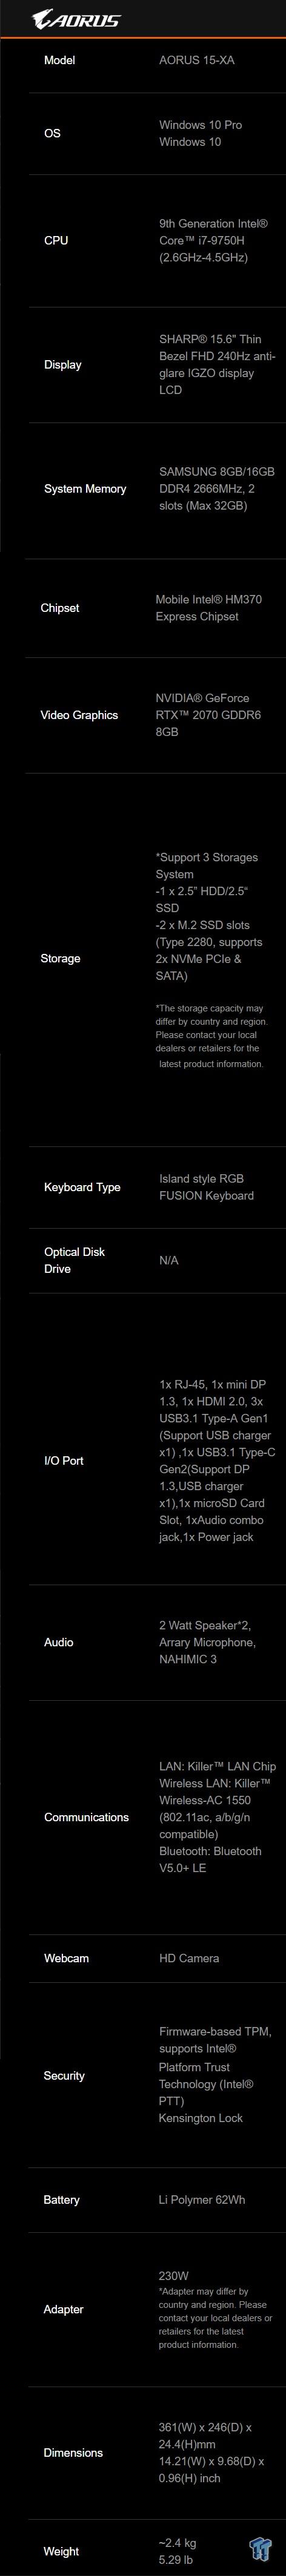 GIGABYTE Aorus 15-XA (Coffee Lake-R) Laptop Review